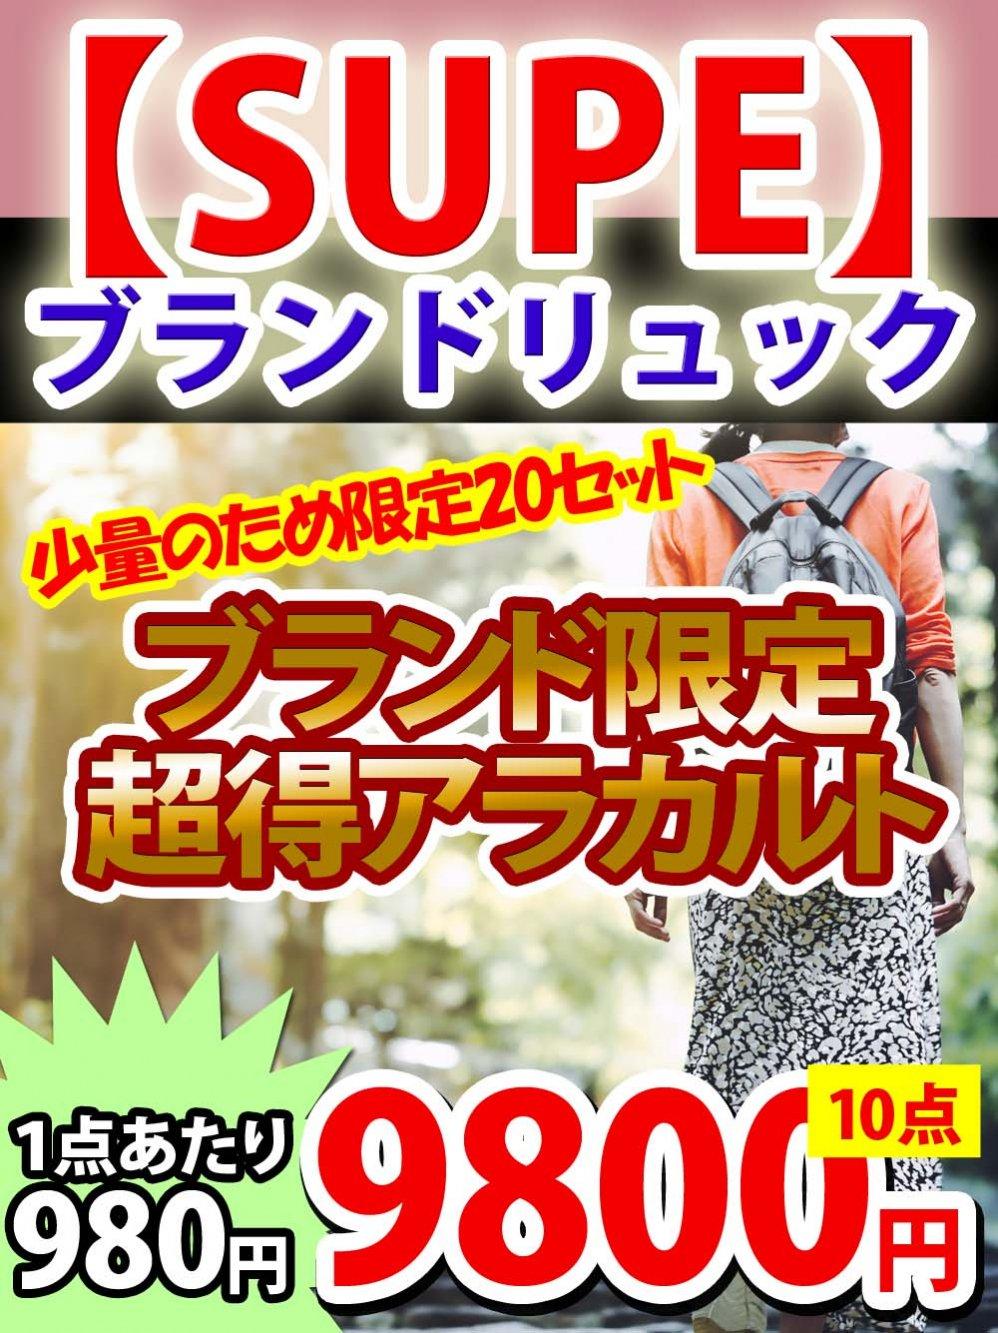 【SUPE】【ブランドリュック980円!】ブランド限定の超得10点アラカルト!少量のため限定20セット